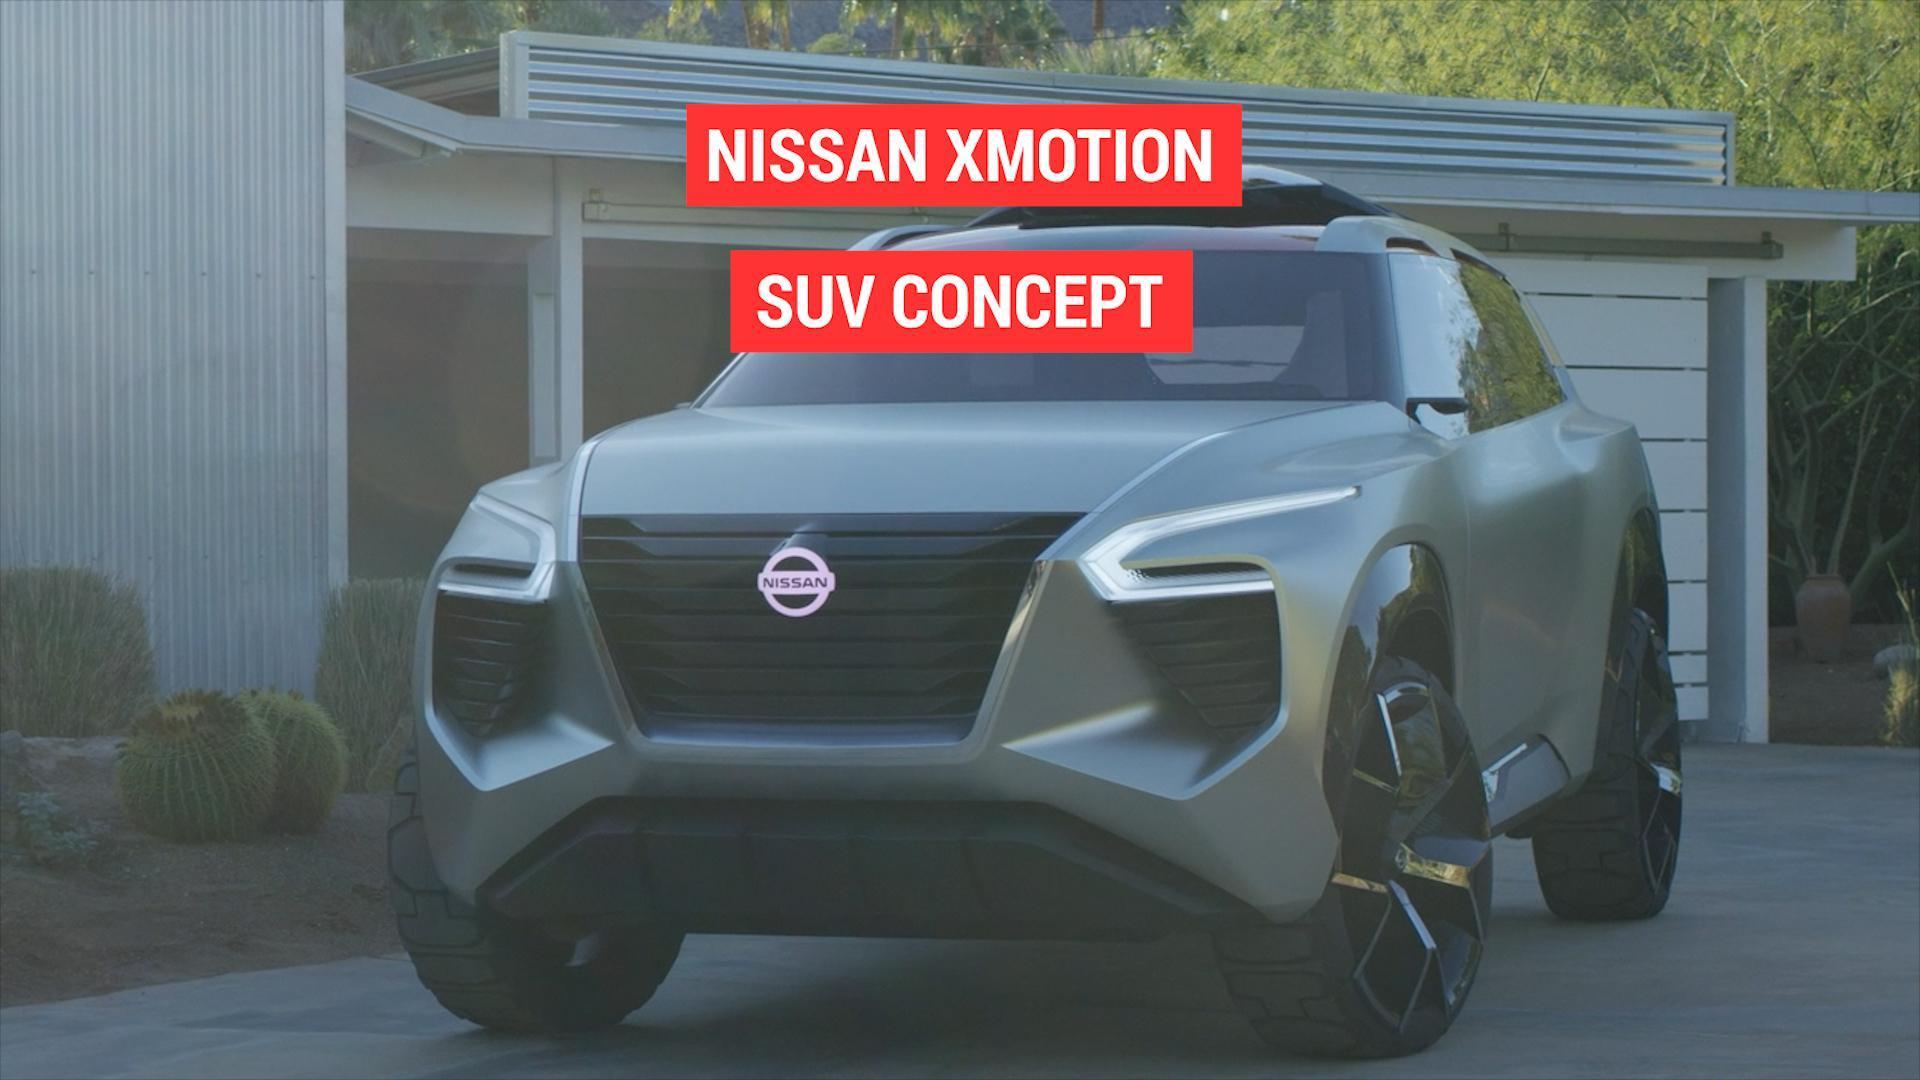 Nissan Xmotion Suv Concept Autoblog